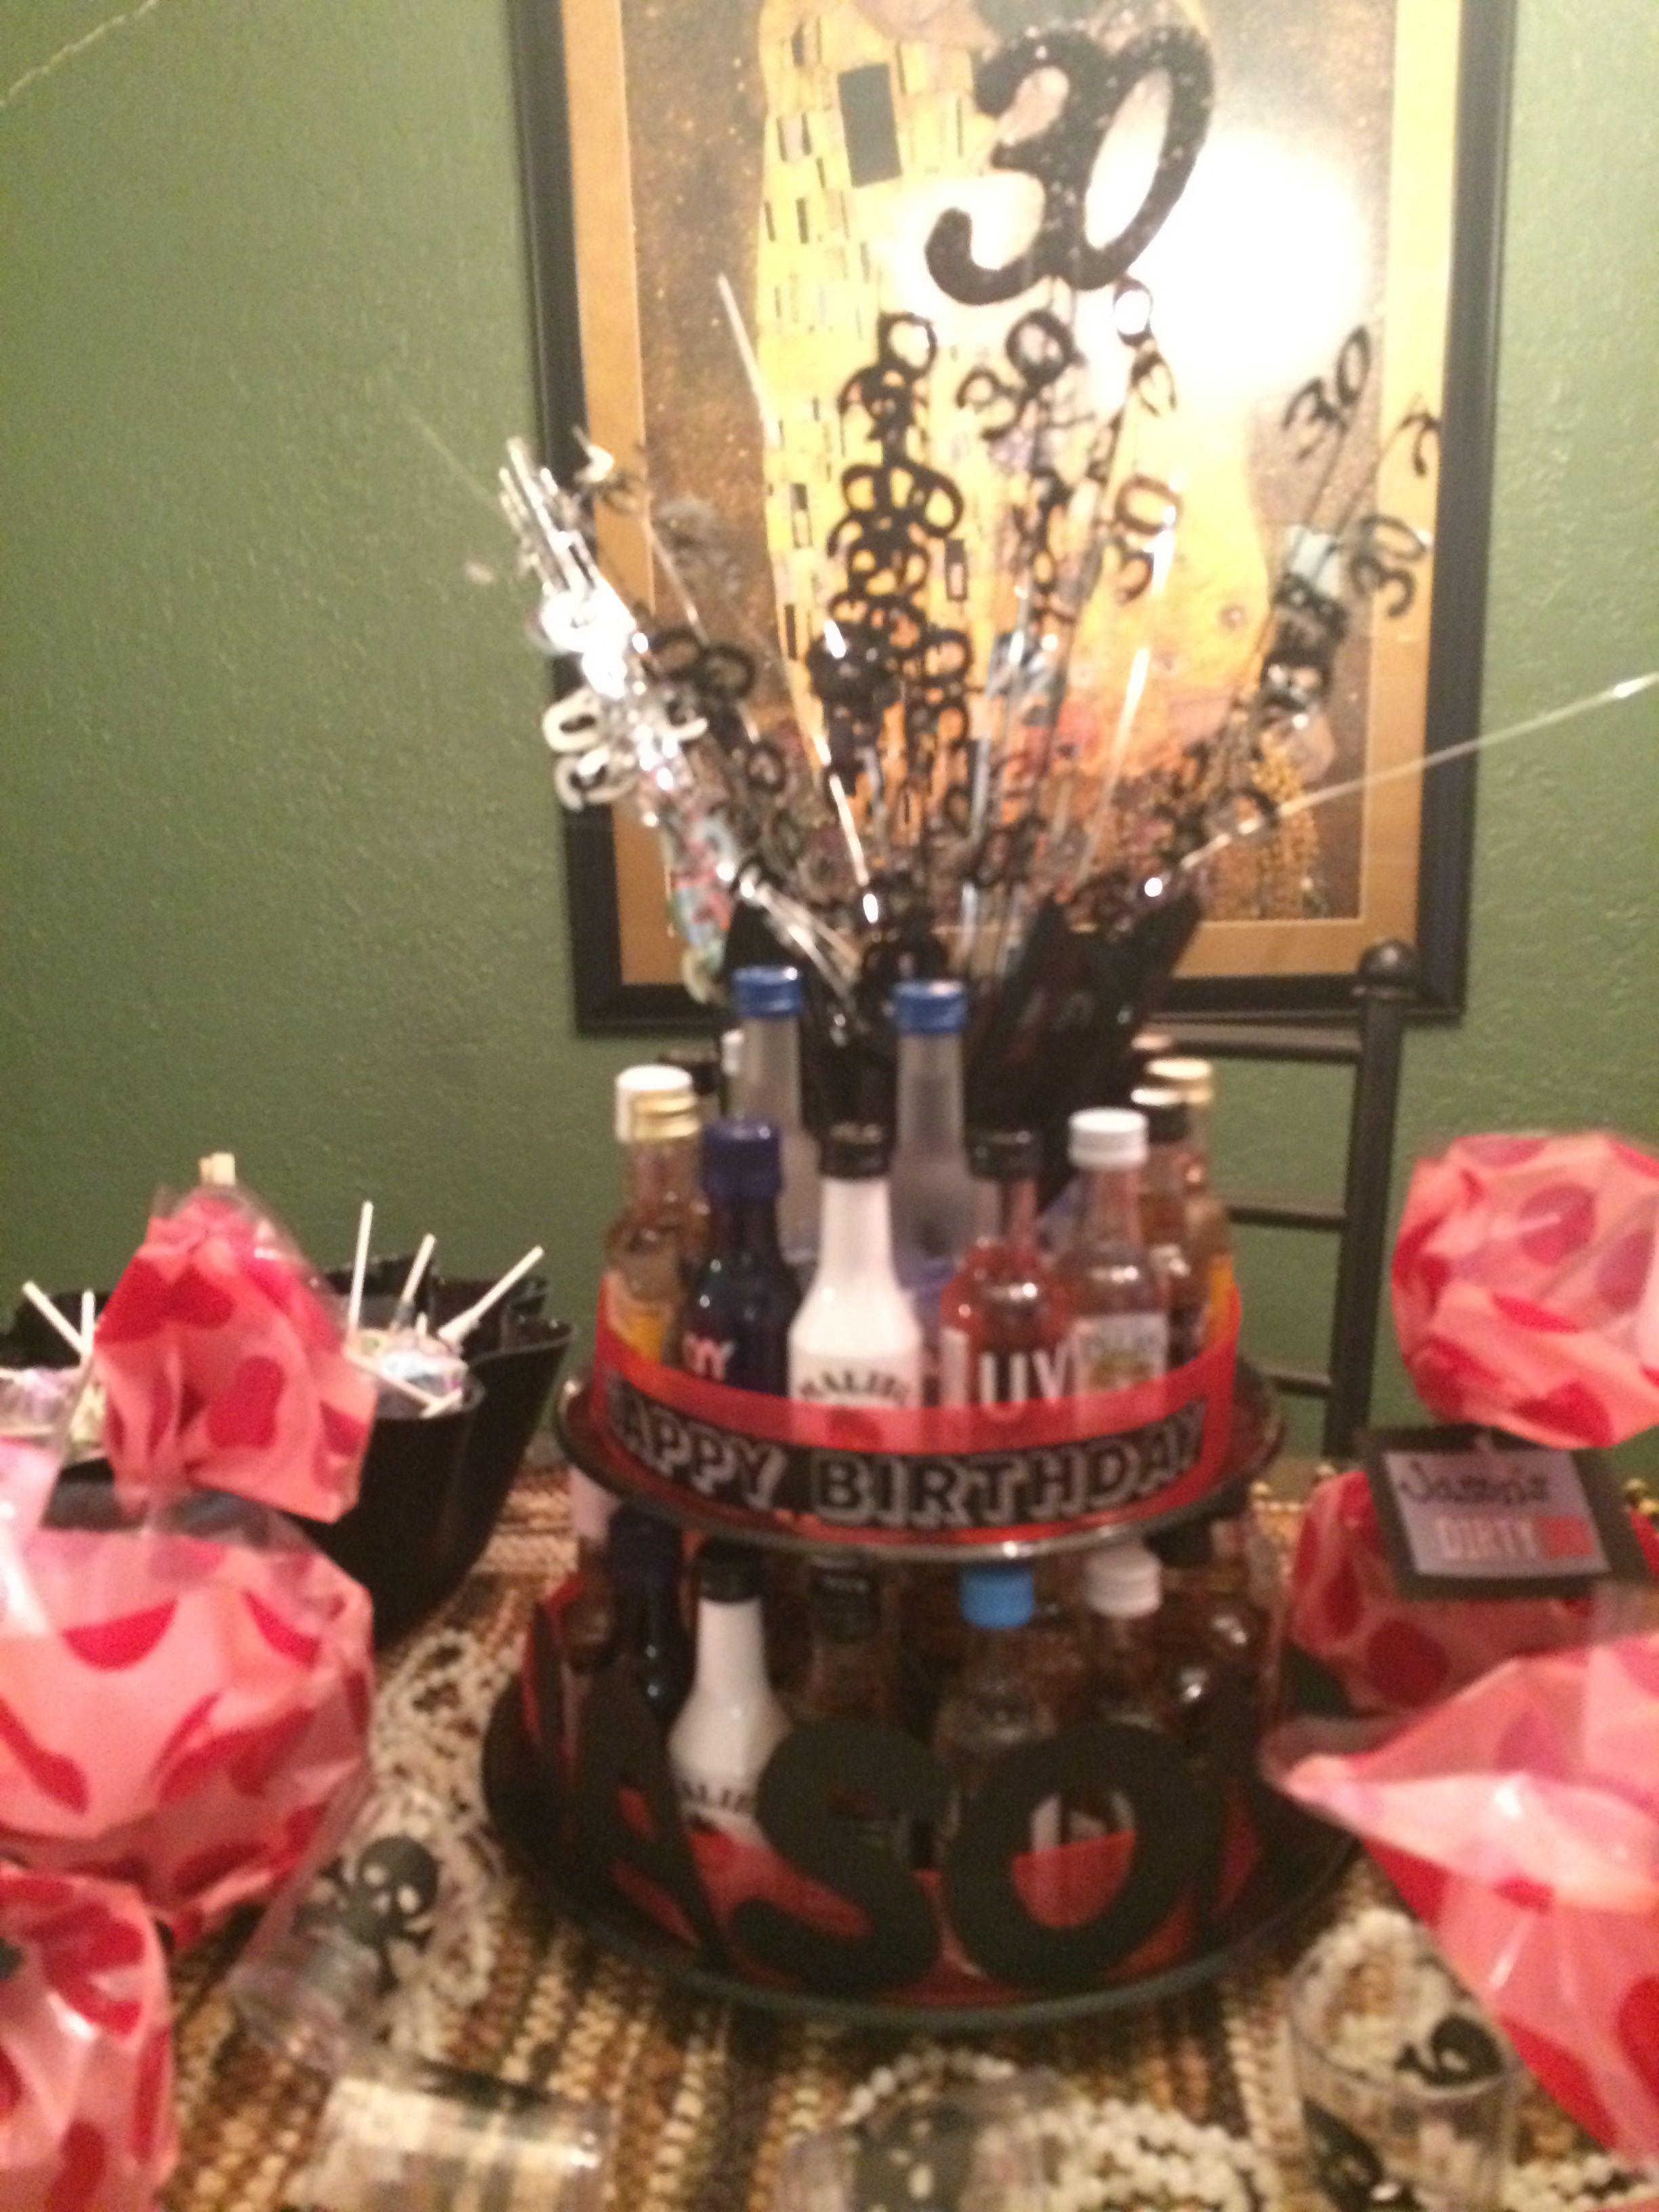 30Th Birthday Mini Liquor Bottle Cake